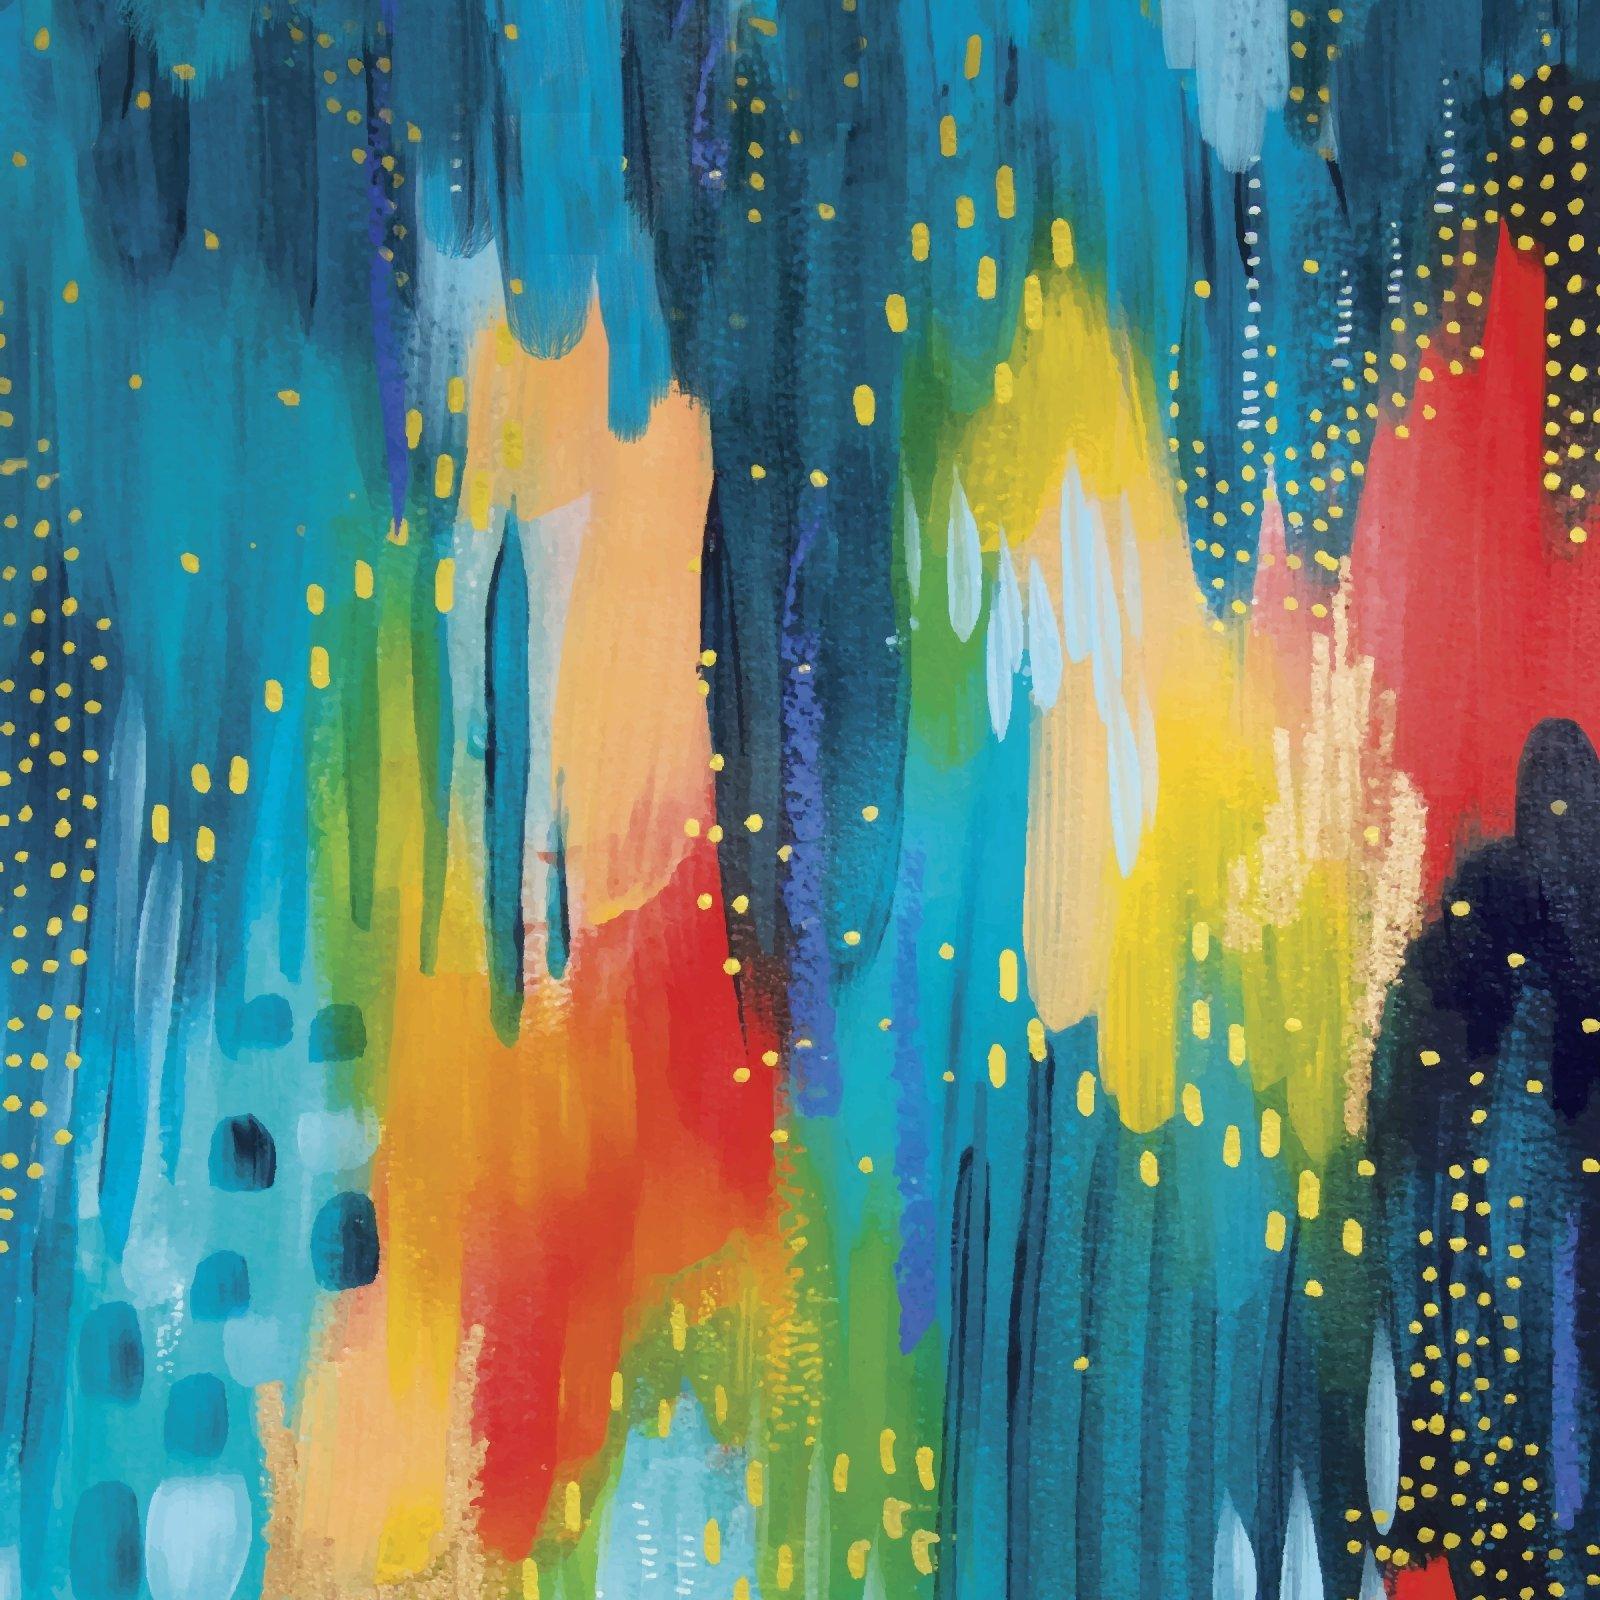 Artsy Brights 14859 Blue - Brushwork